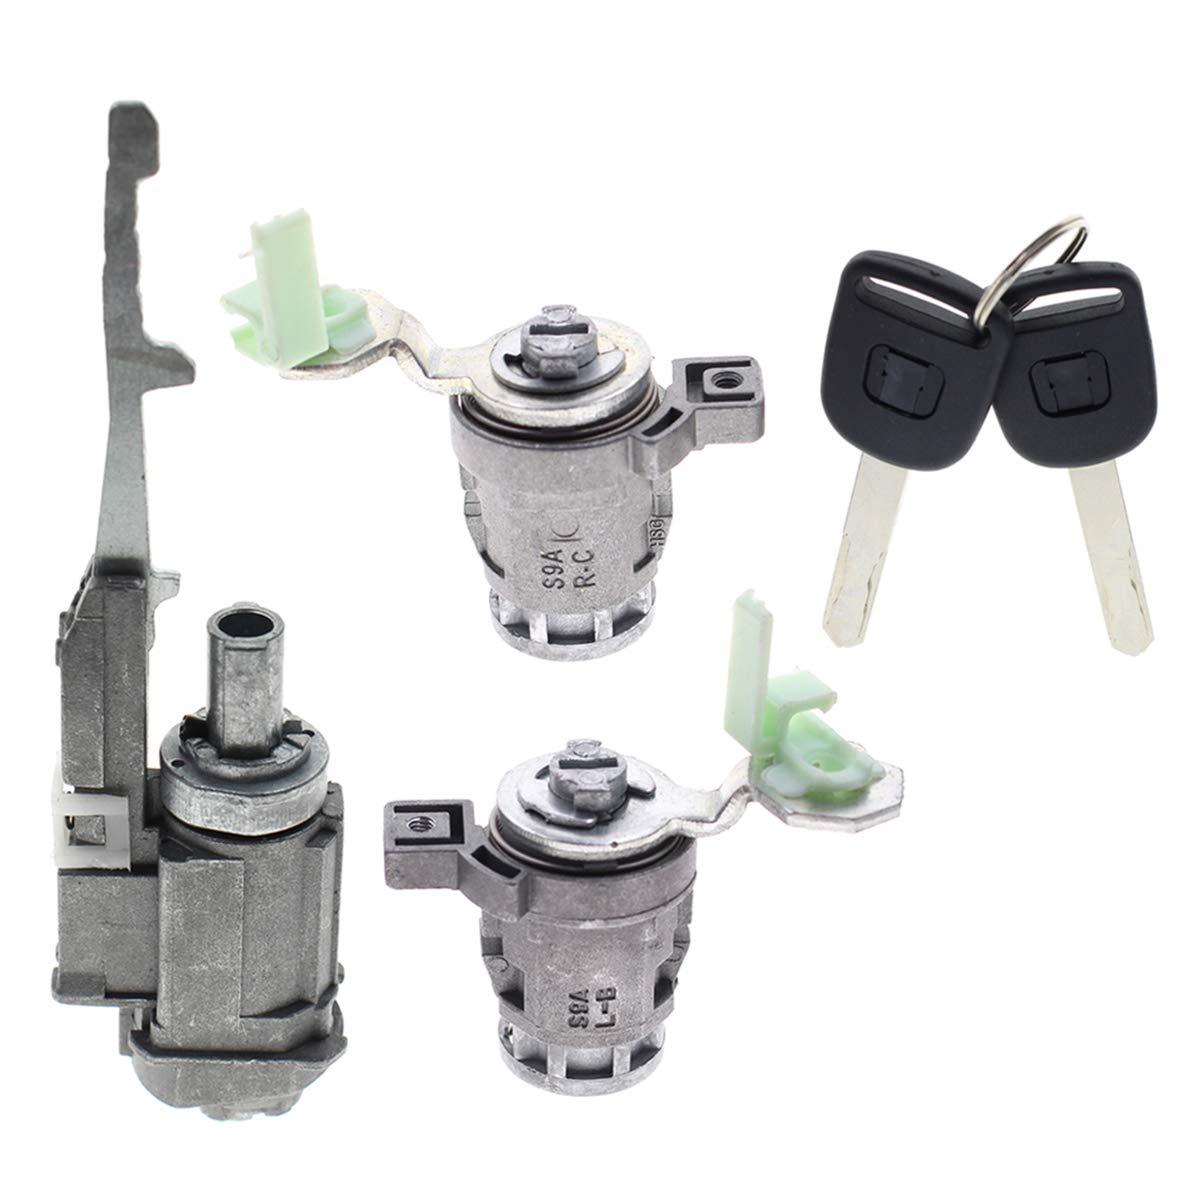 AUTOKAY Door Lock Cylinder Set W//Ignition Switch Lock for Honda Civic CRV S2000 Element